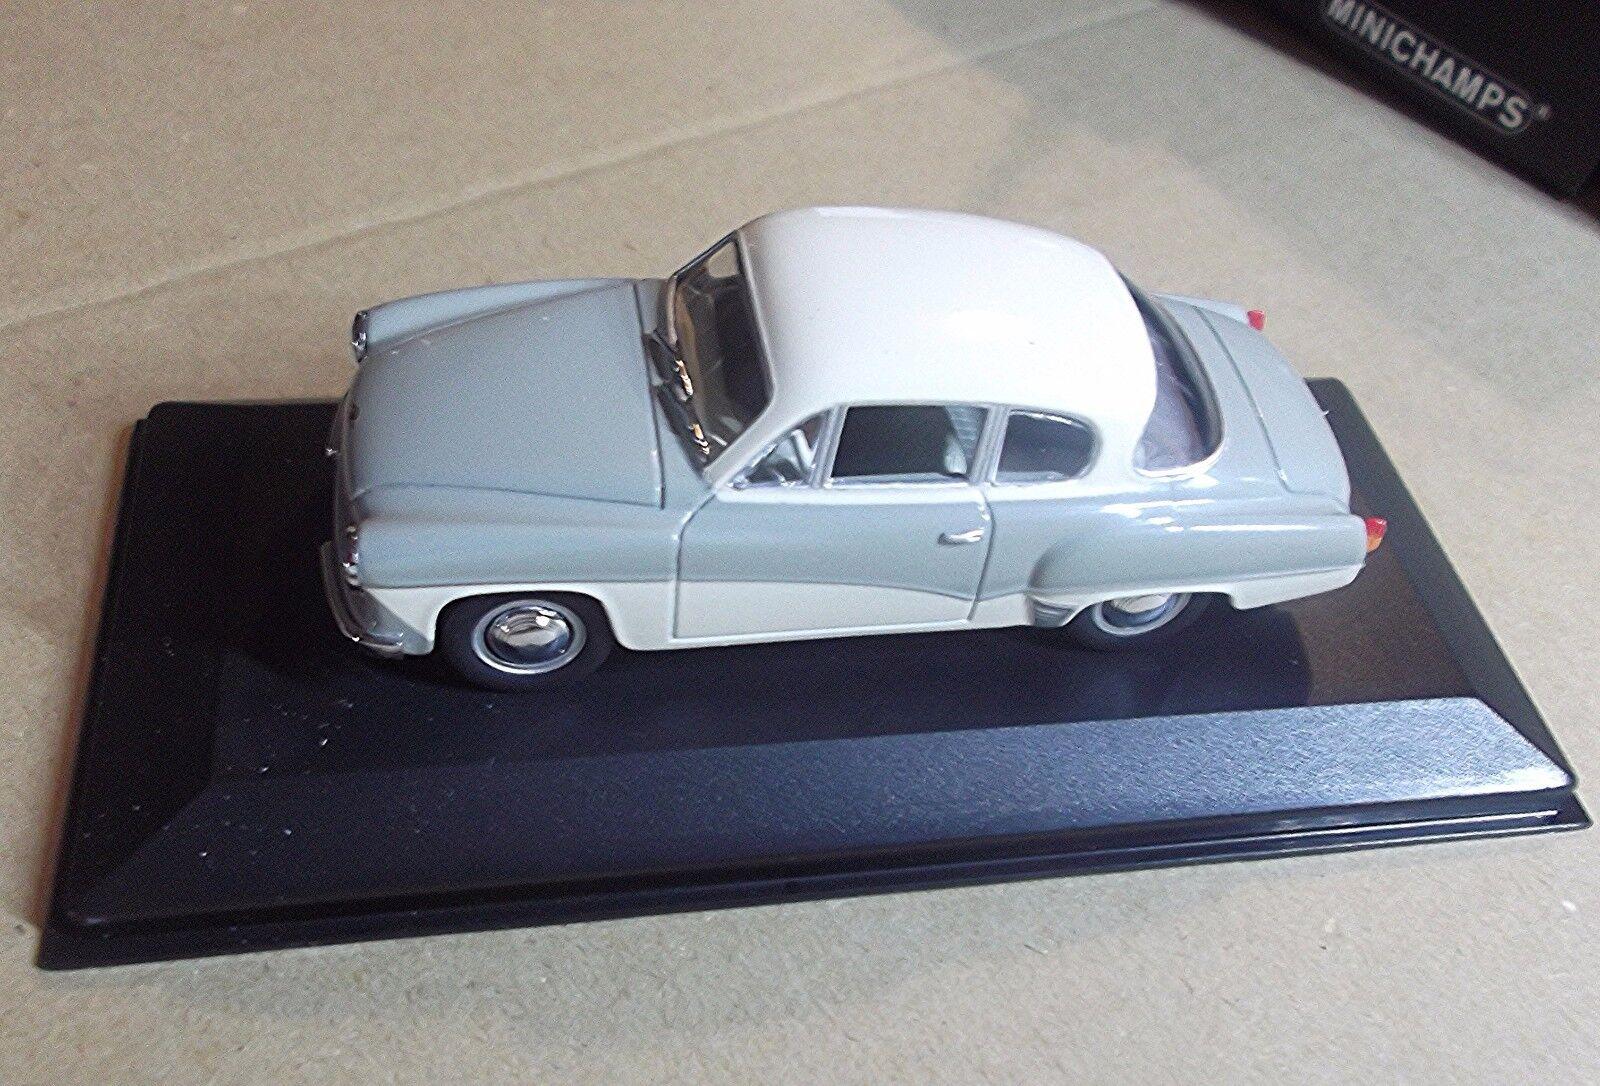 43015920 Minichamps Escala 1 43  Wartburg un 312 Coupé  grigio biancao